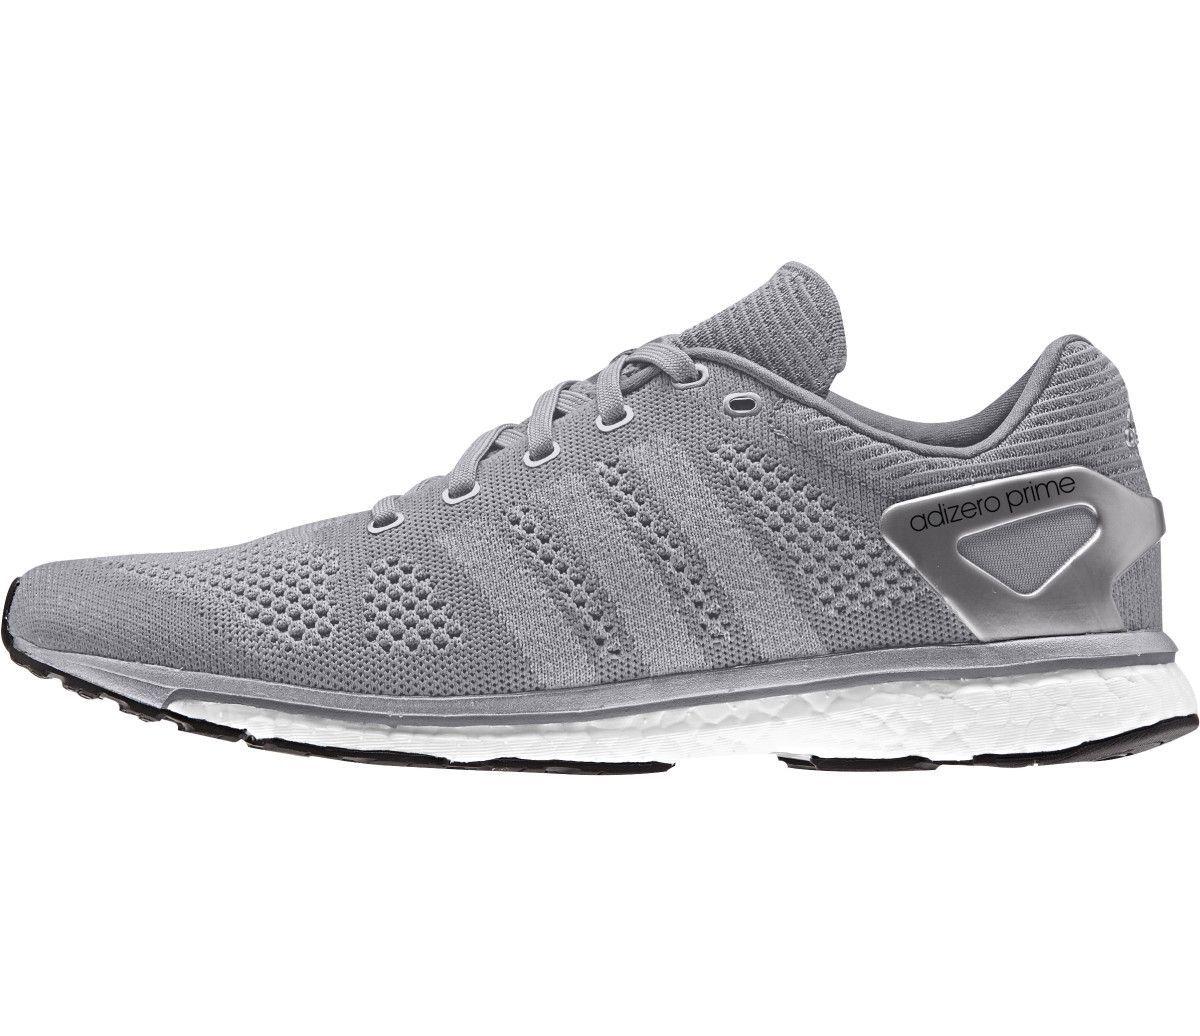 Adizero Sneakers Prime Mens Adidas Ltd AL54j3R